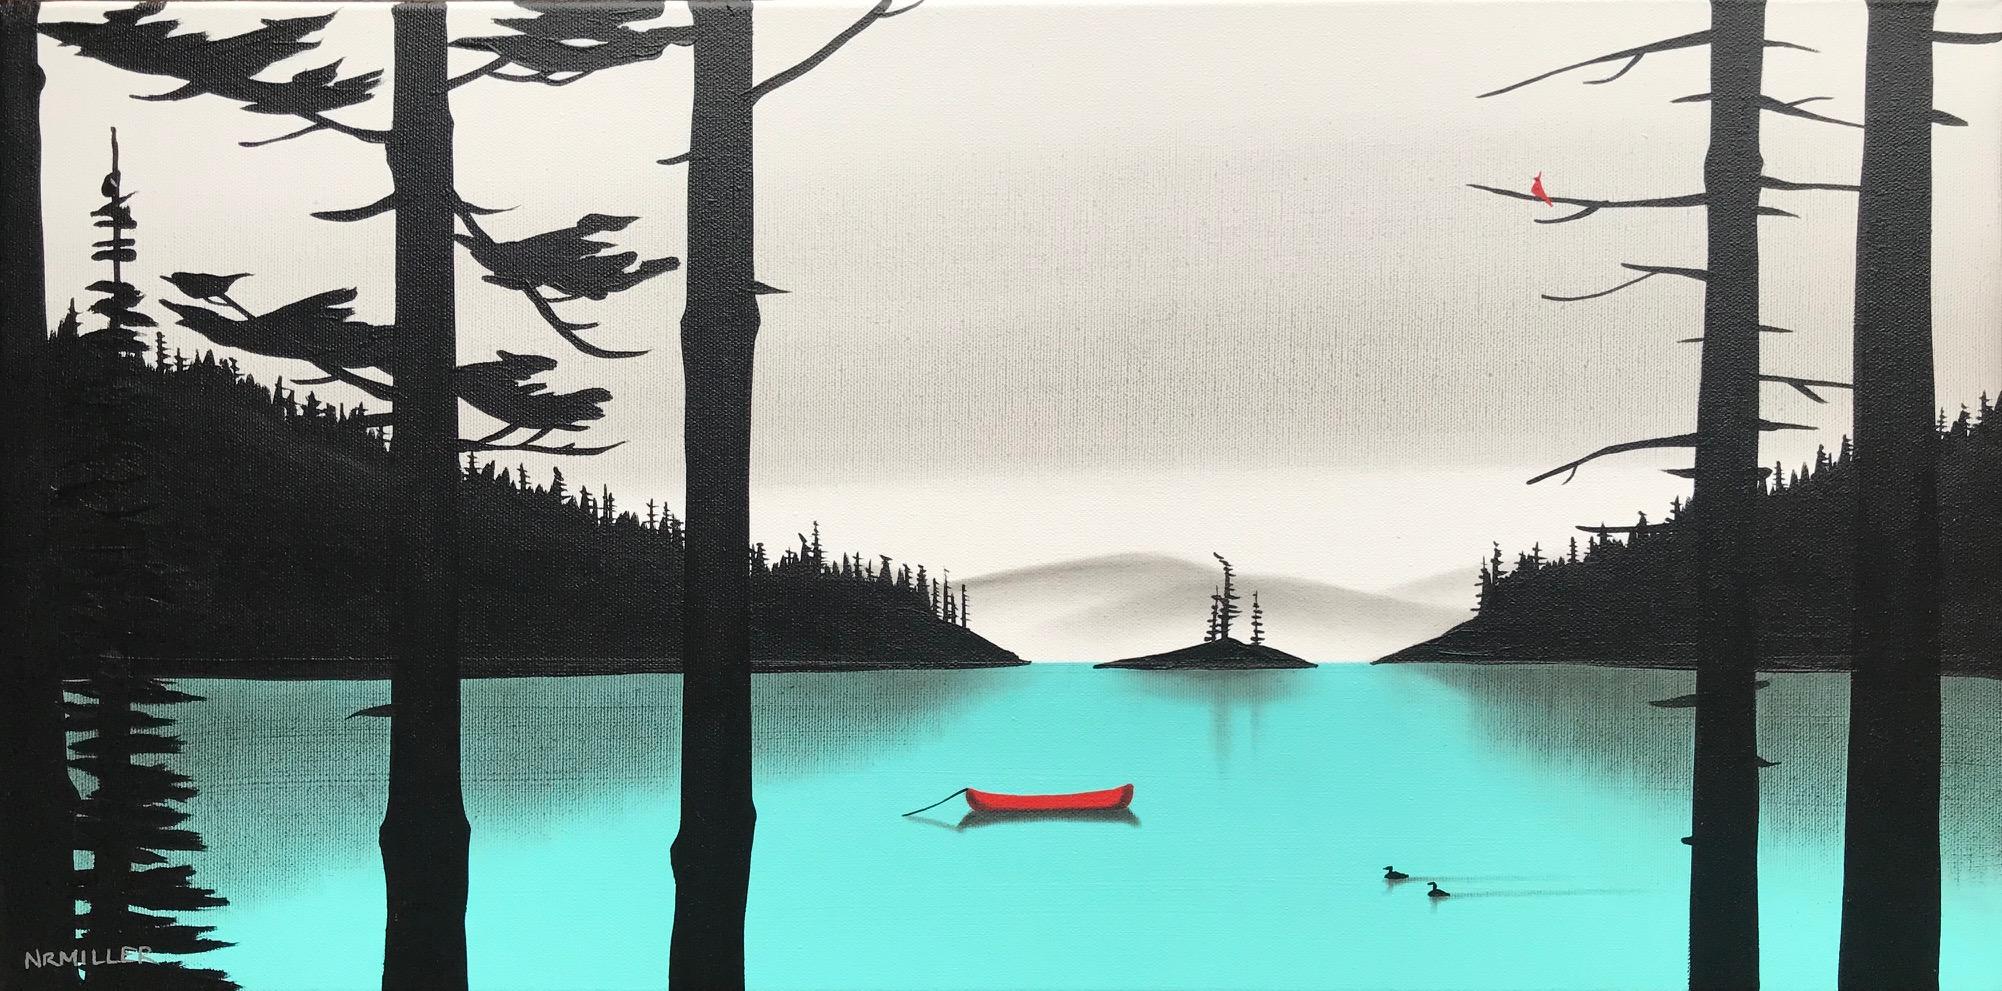 Linger at the Lake, mixed media Lake Louise painting by Natasha Miller | Effusion Art Gallery + Cast Glass Studio, Invermere BC